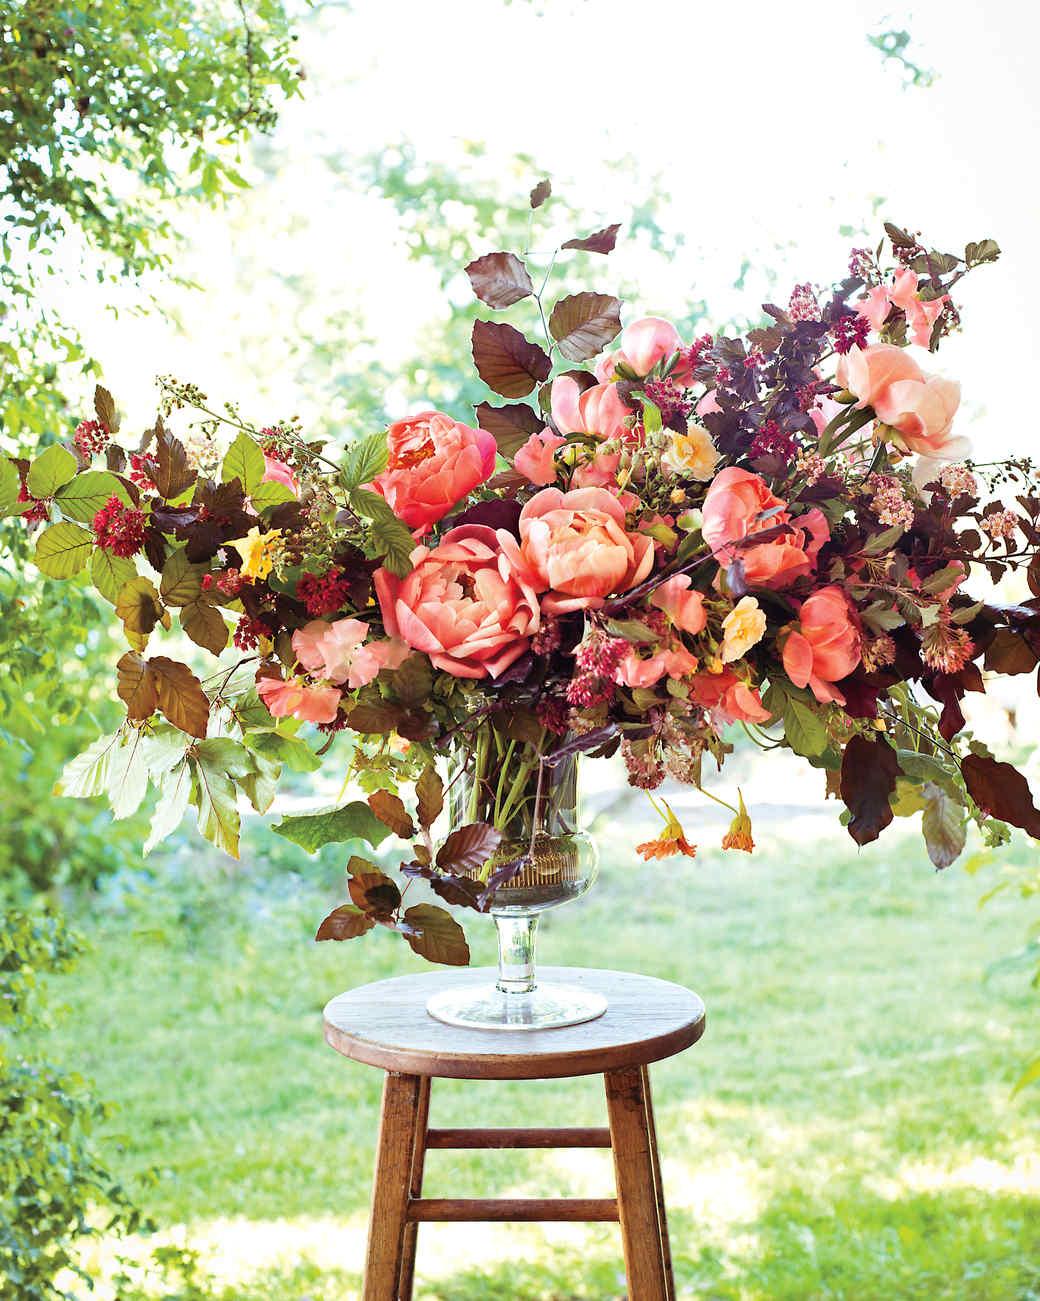 floret-flower-farm-61-edit-d111323.jpg